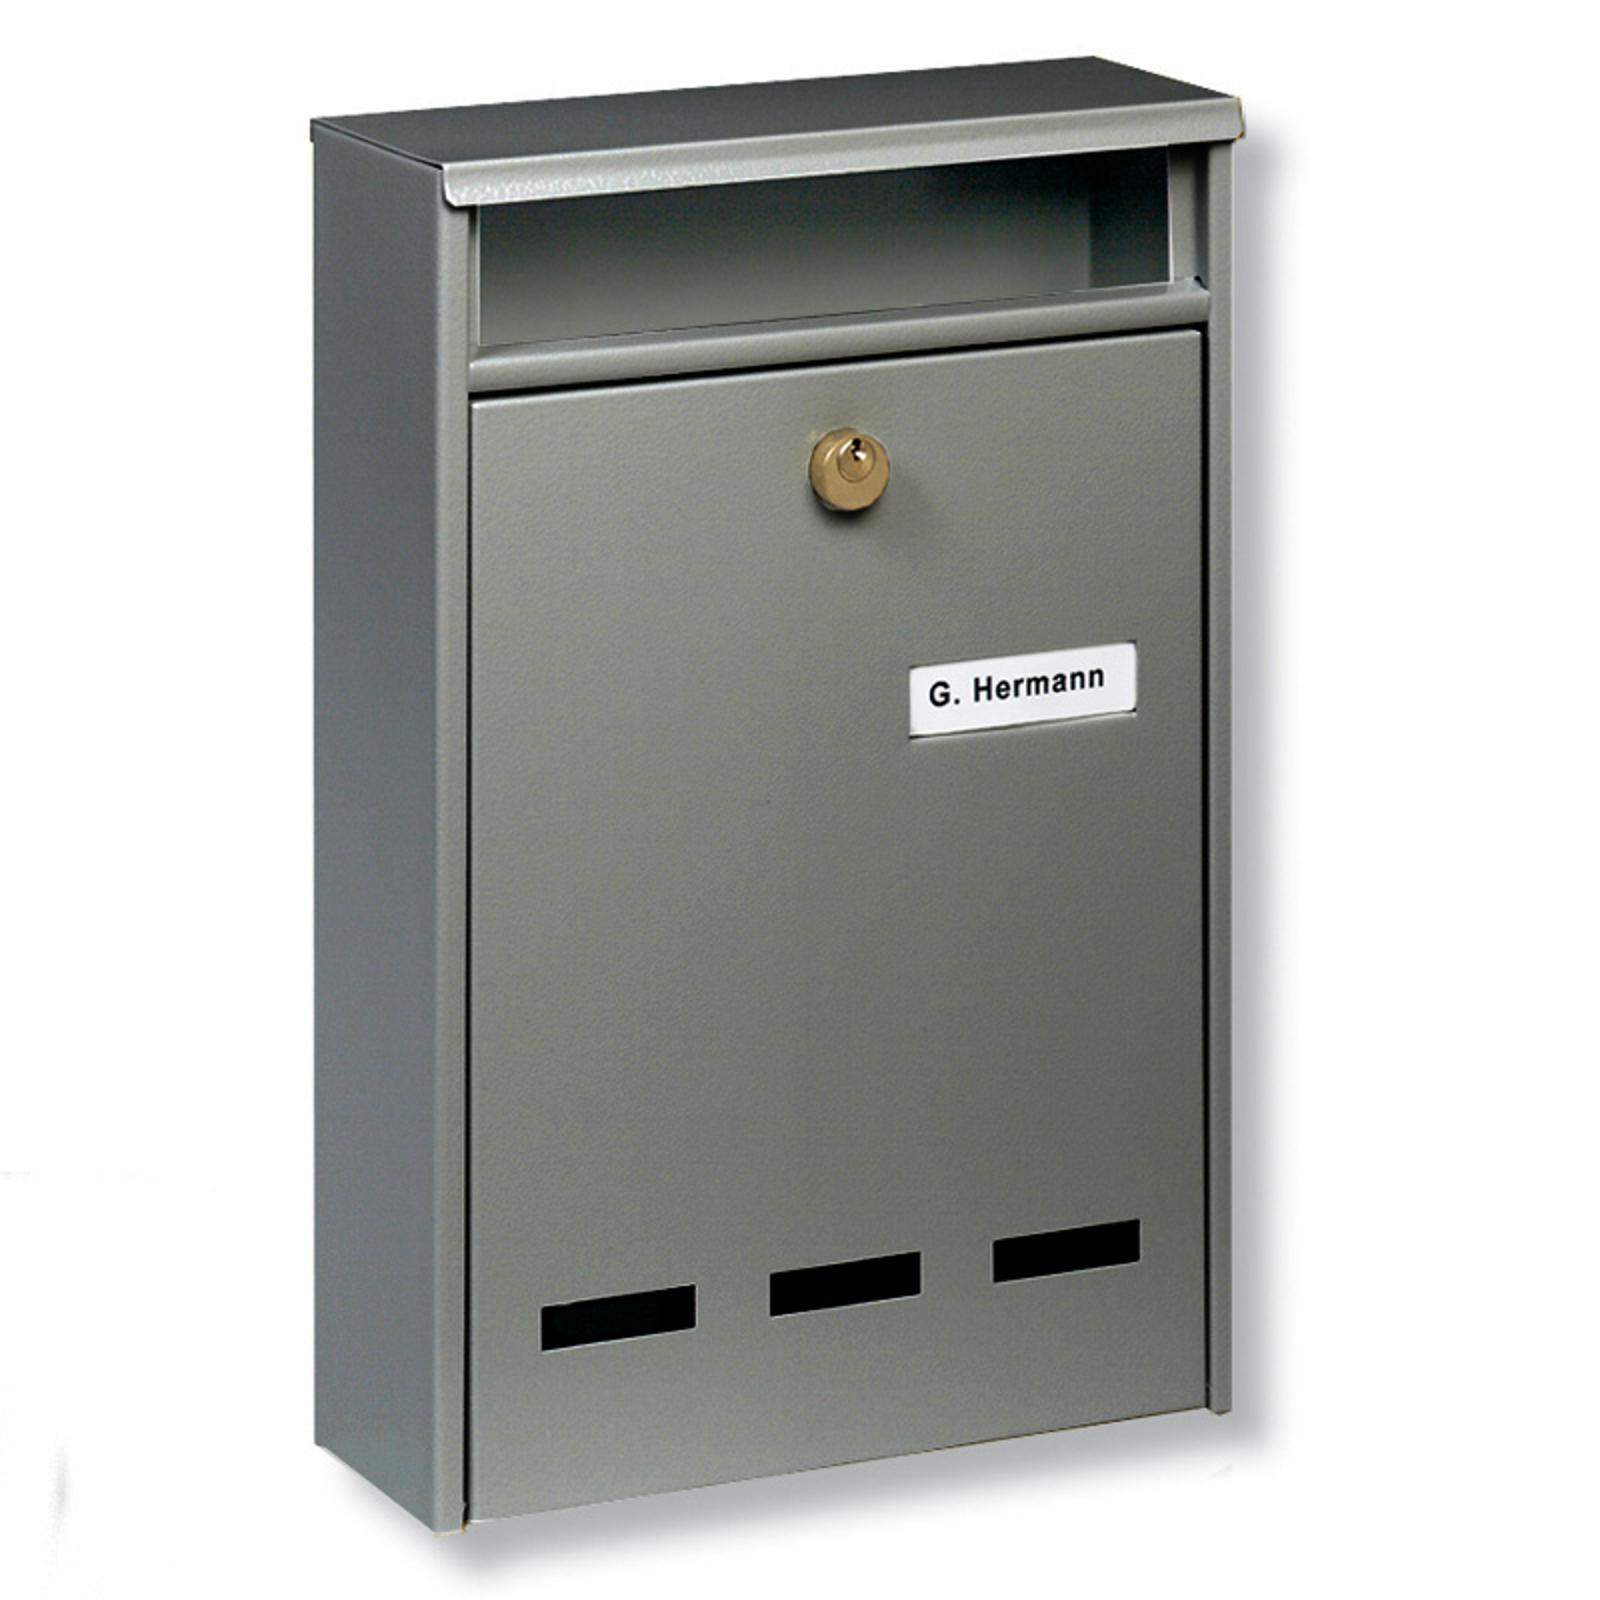 Standard anläggnings-brevlåda Wismar B5, grå